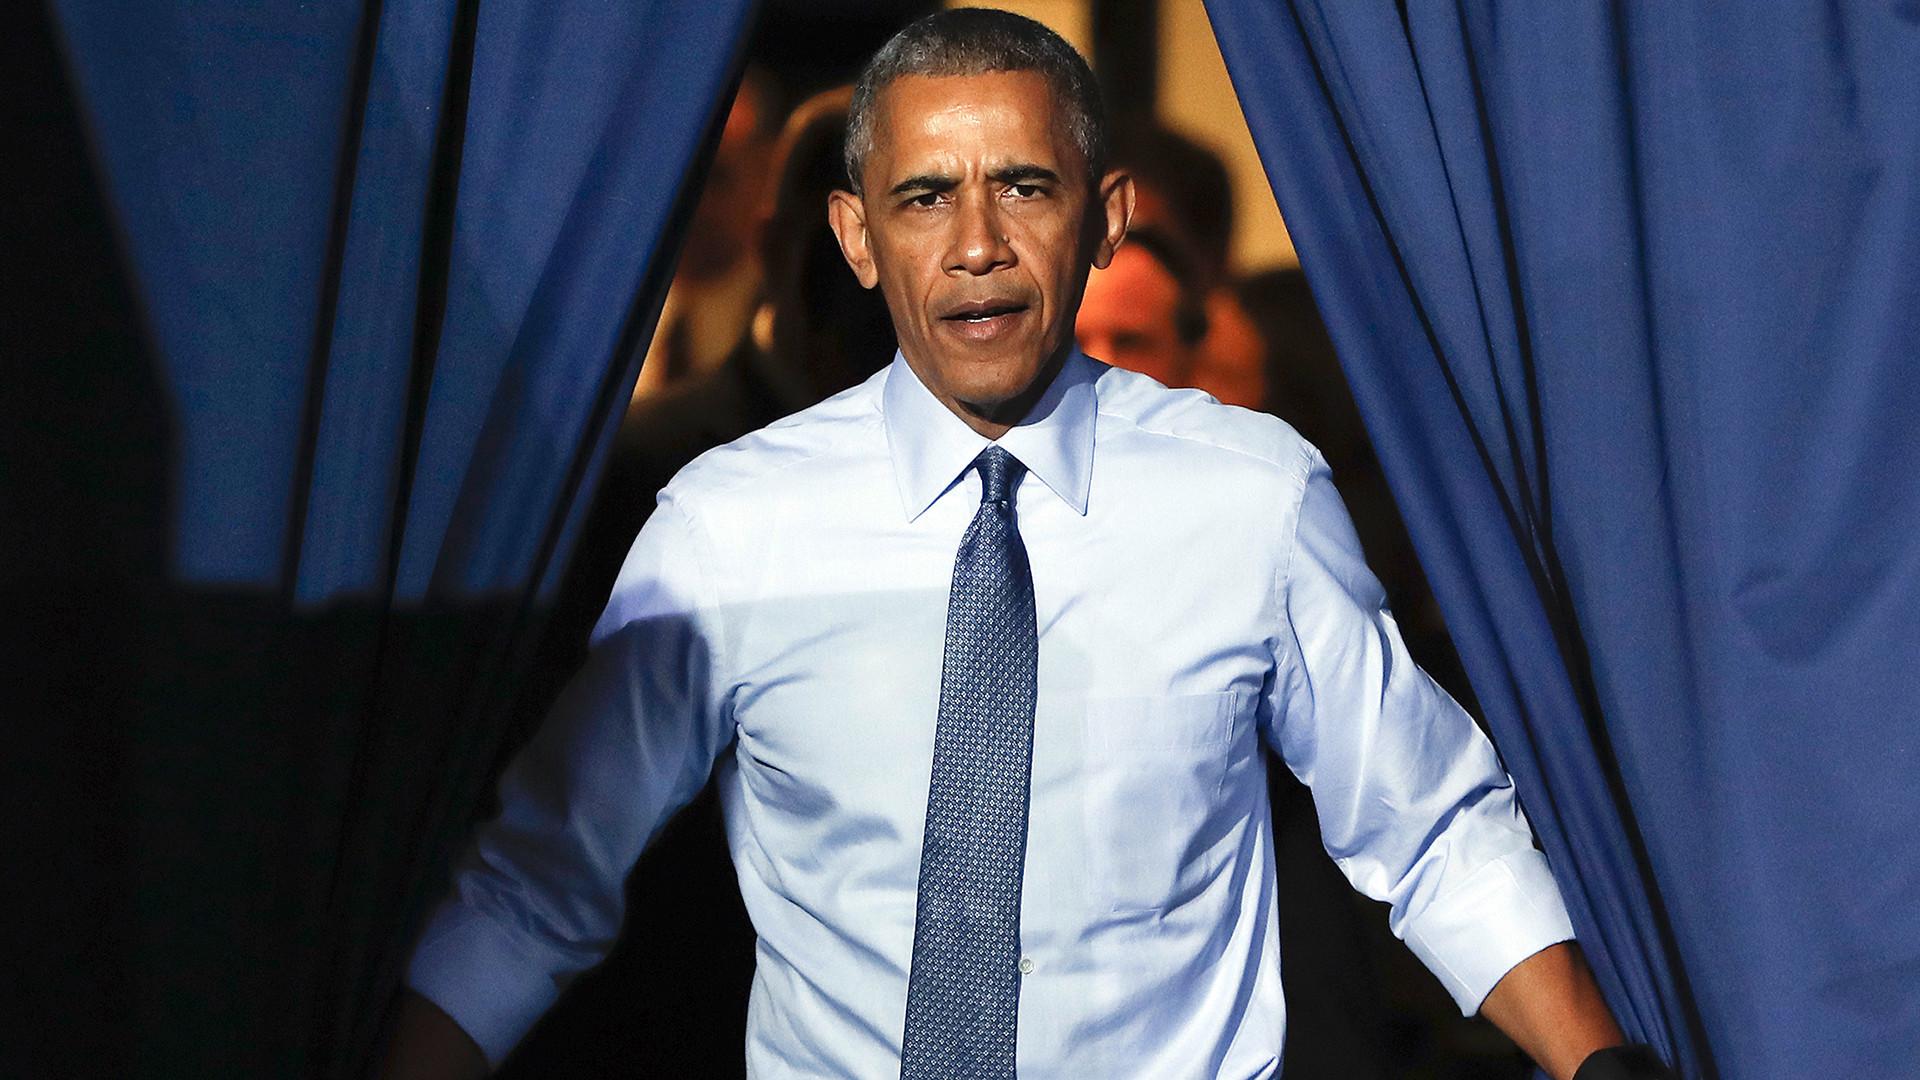 ct-barack-obama-chicago-speech-met-0421-20170421.jpg